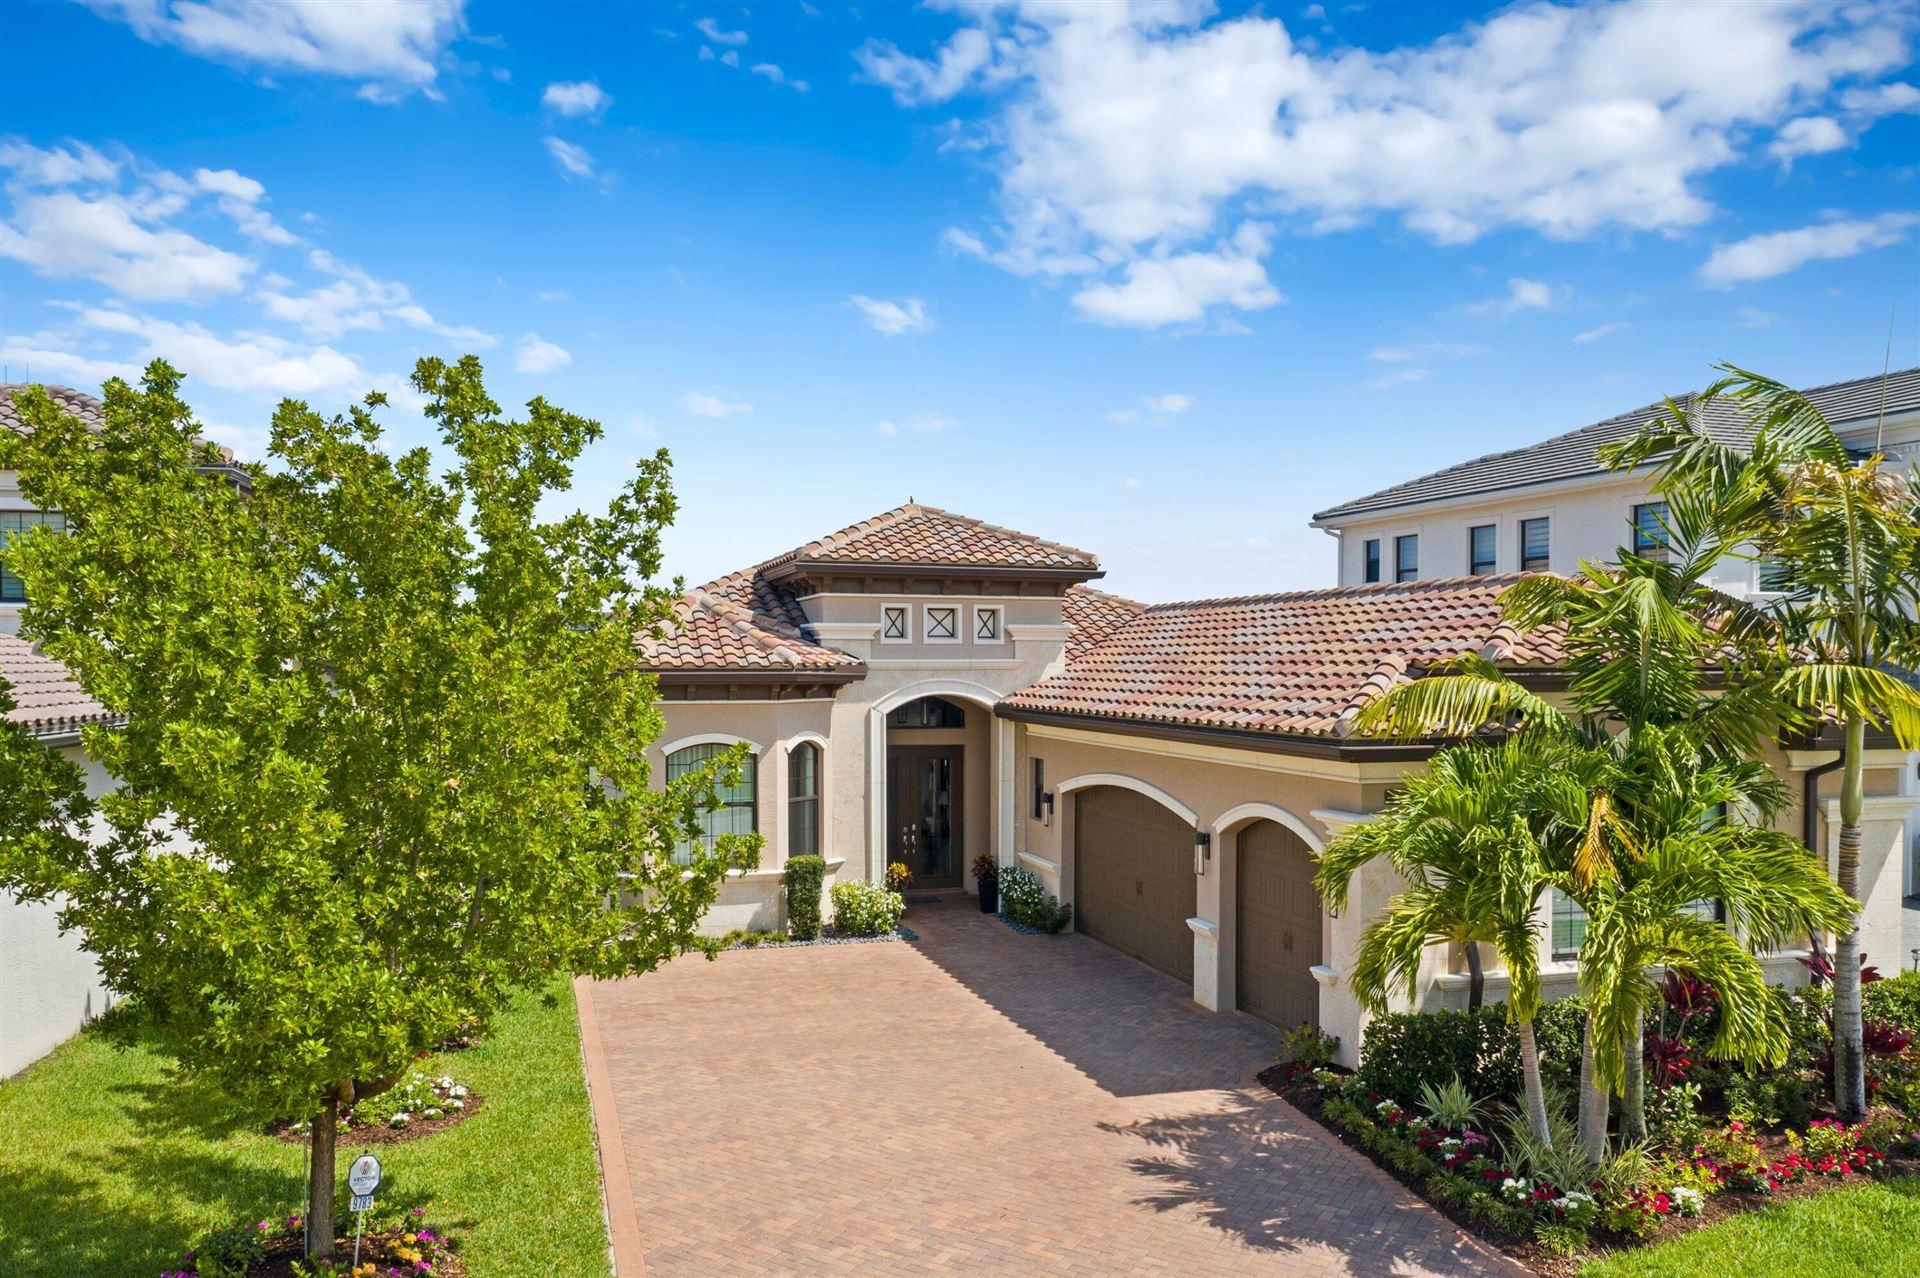 9783 Vitrail Lane, Delray Beach, FL 33446 - MLS#: RX-10709987